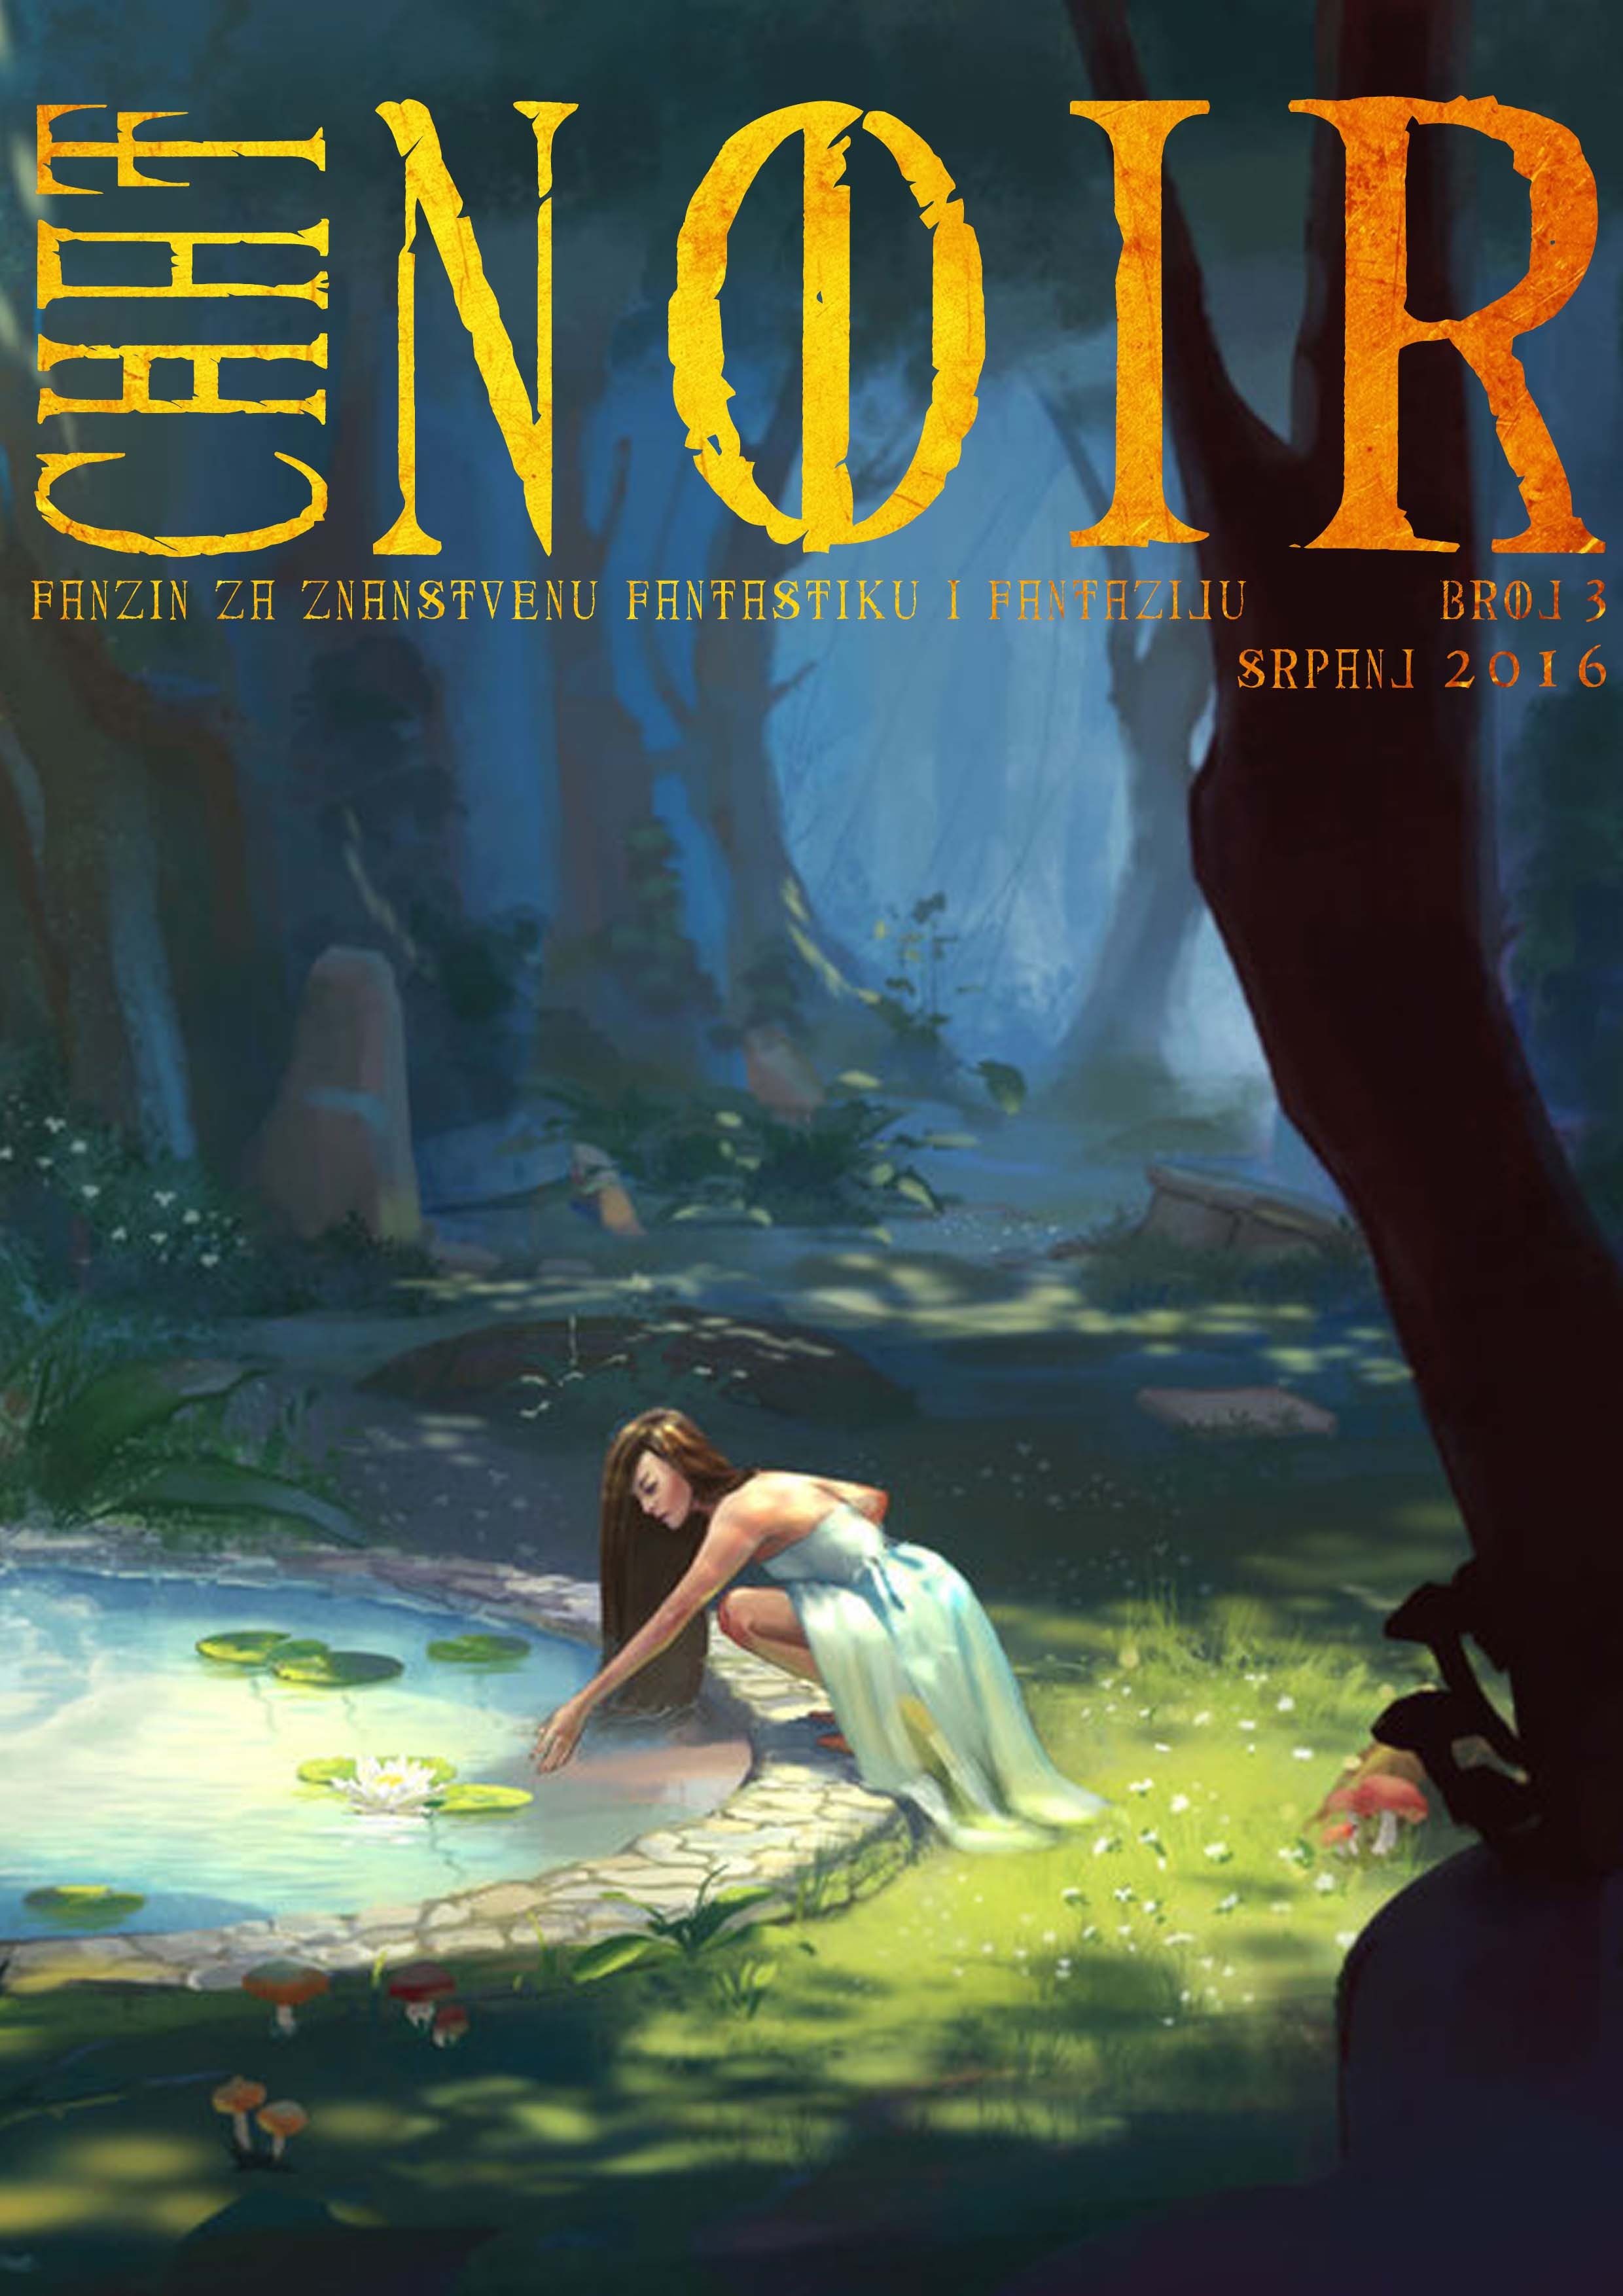 Chat Noir je nominiran za najbolji europski fanzin